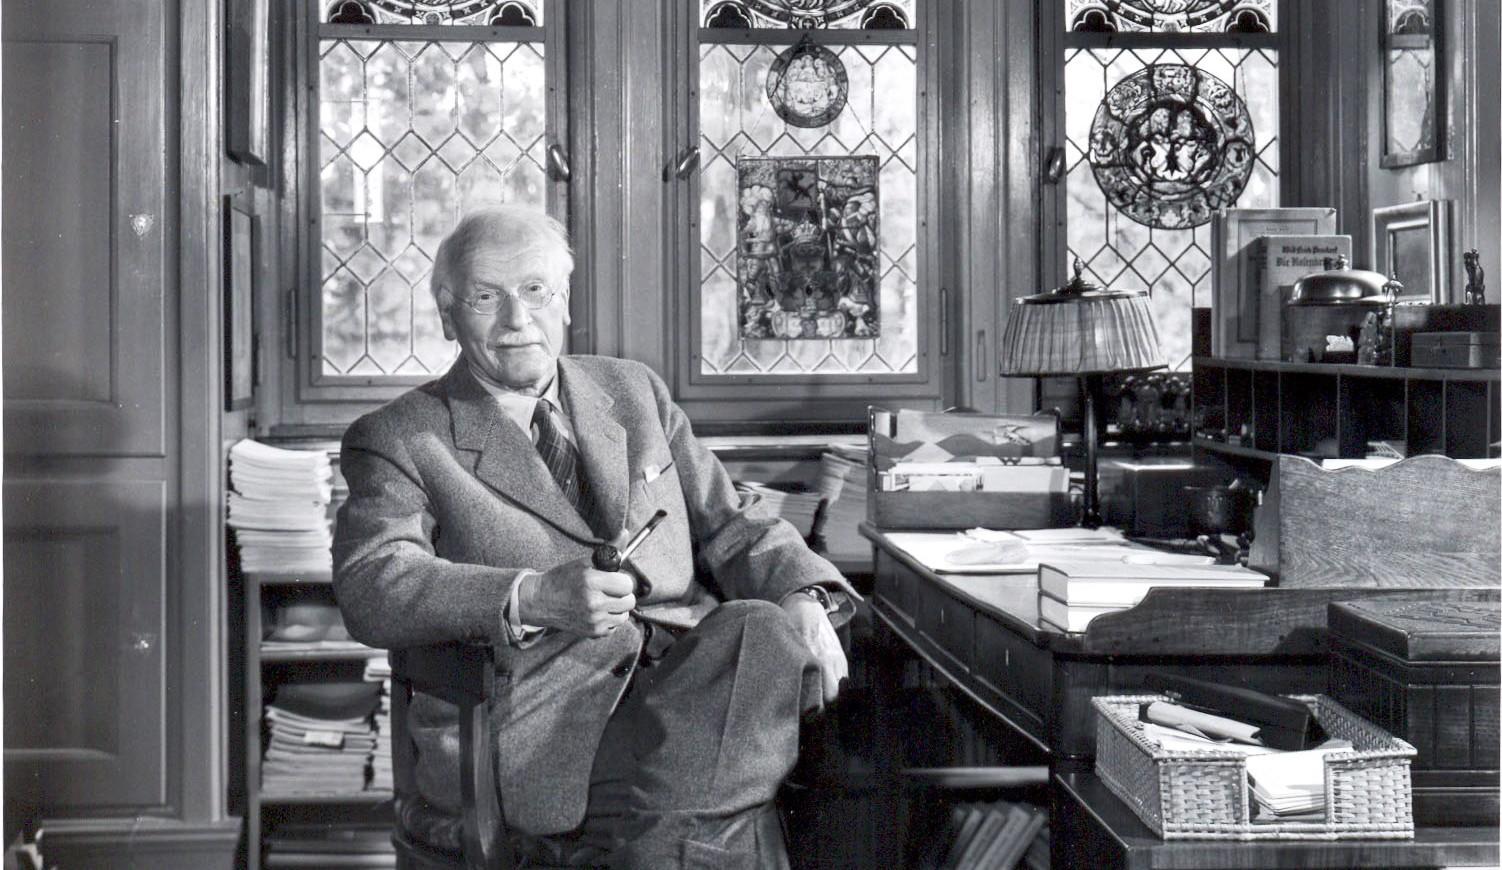 WhenUFOsGet Jung cropped-carl